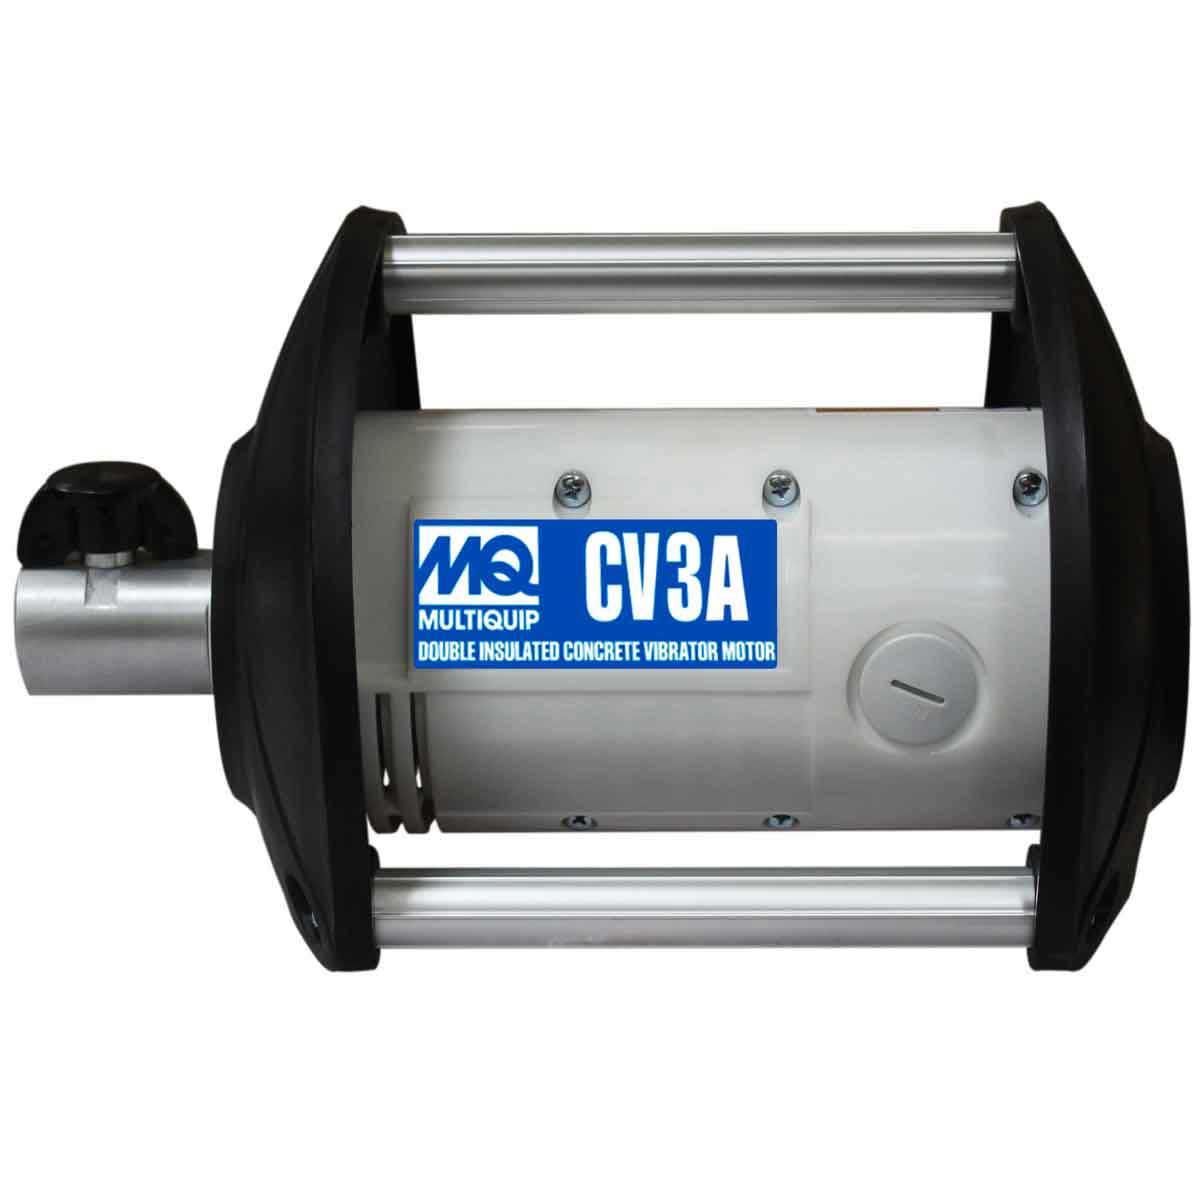 CV3A Multiquip Concrete vibrator